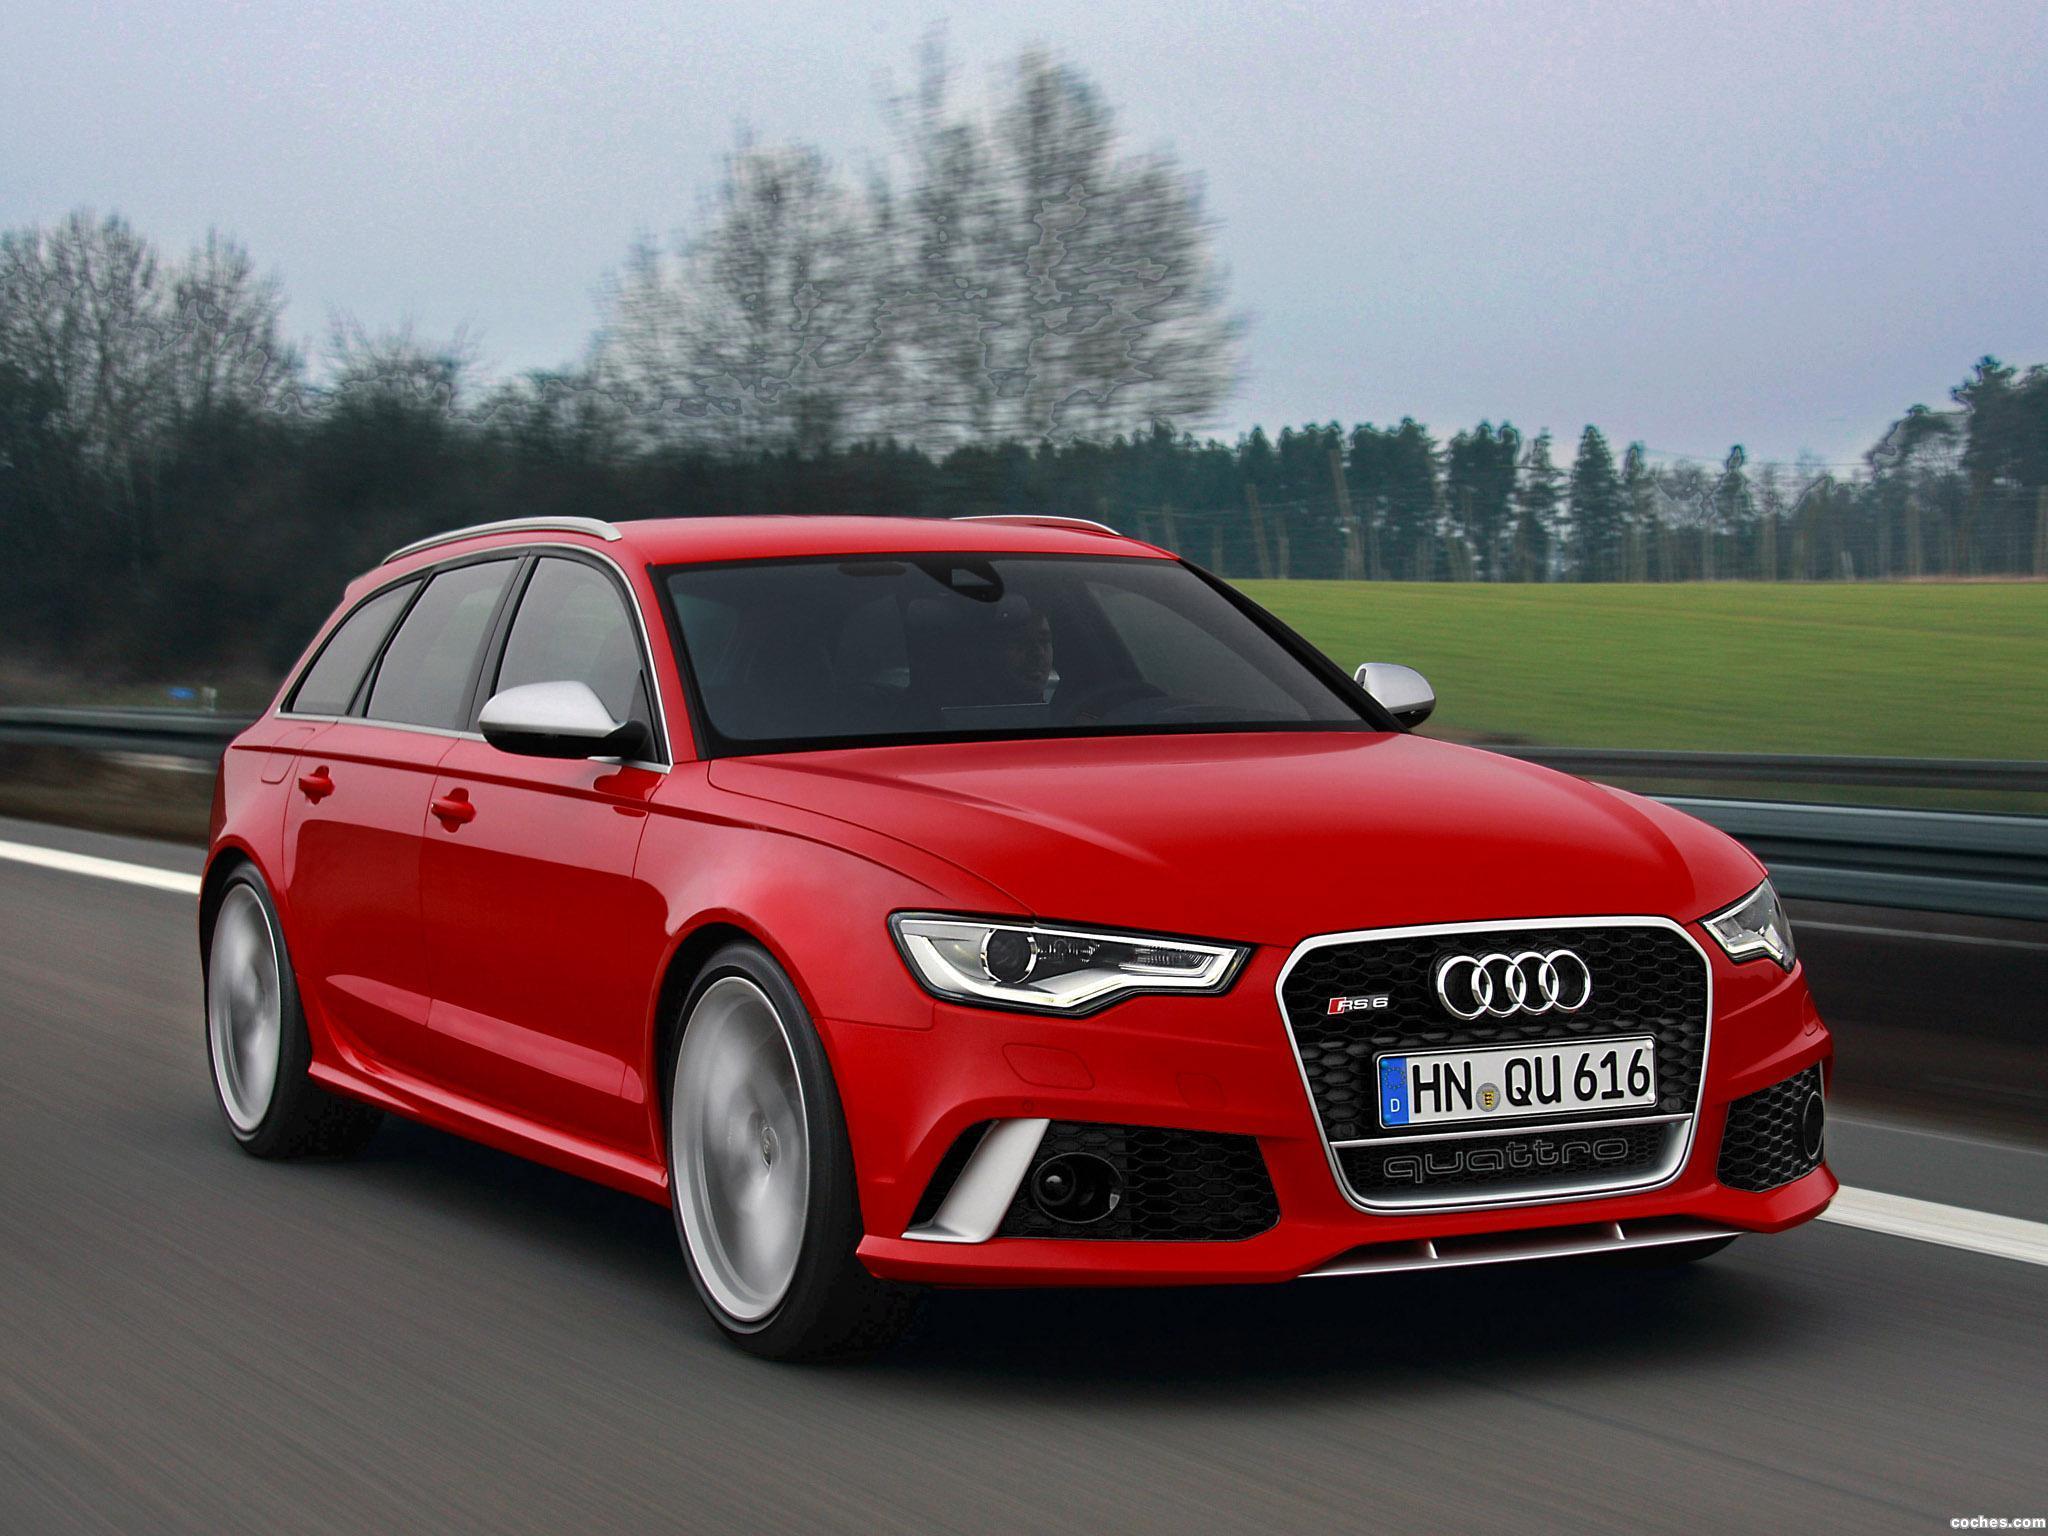 Foto 1 de Audi RS6 Avant 2013